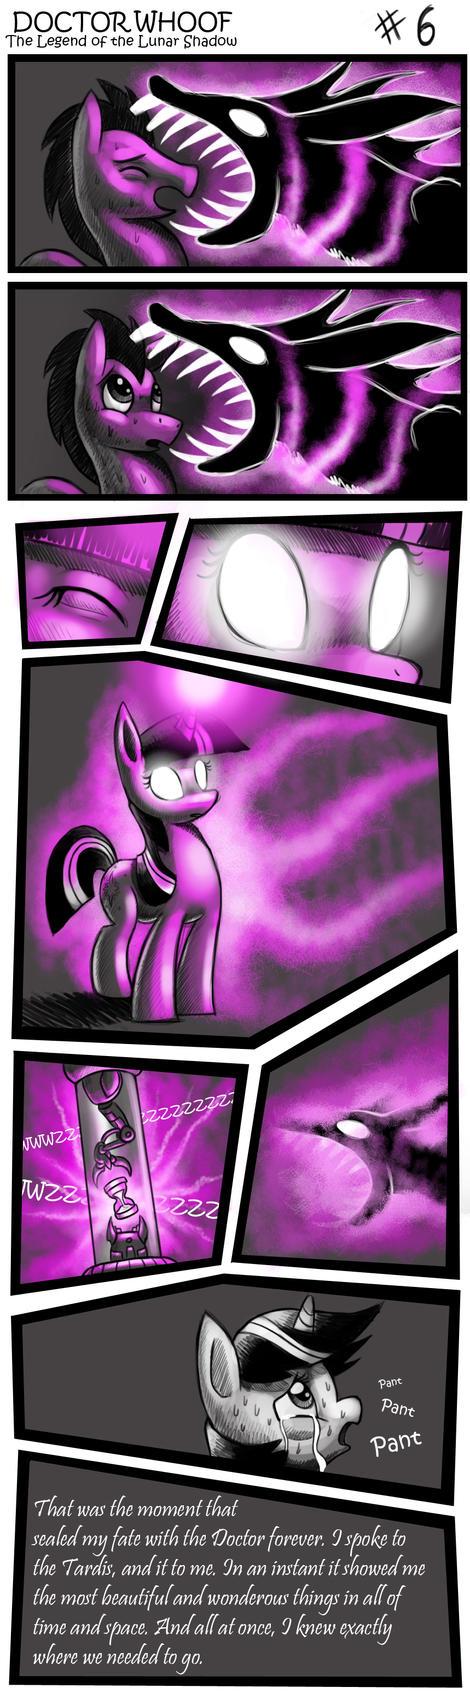 DOCTOR WHOOF  Lunar Shadow 6 by CyberToaster